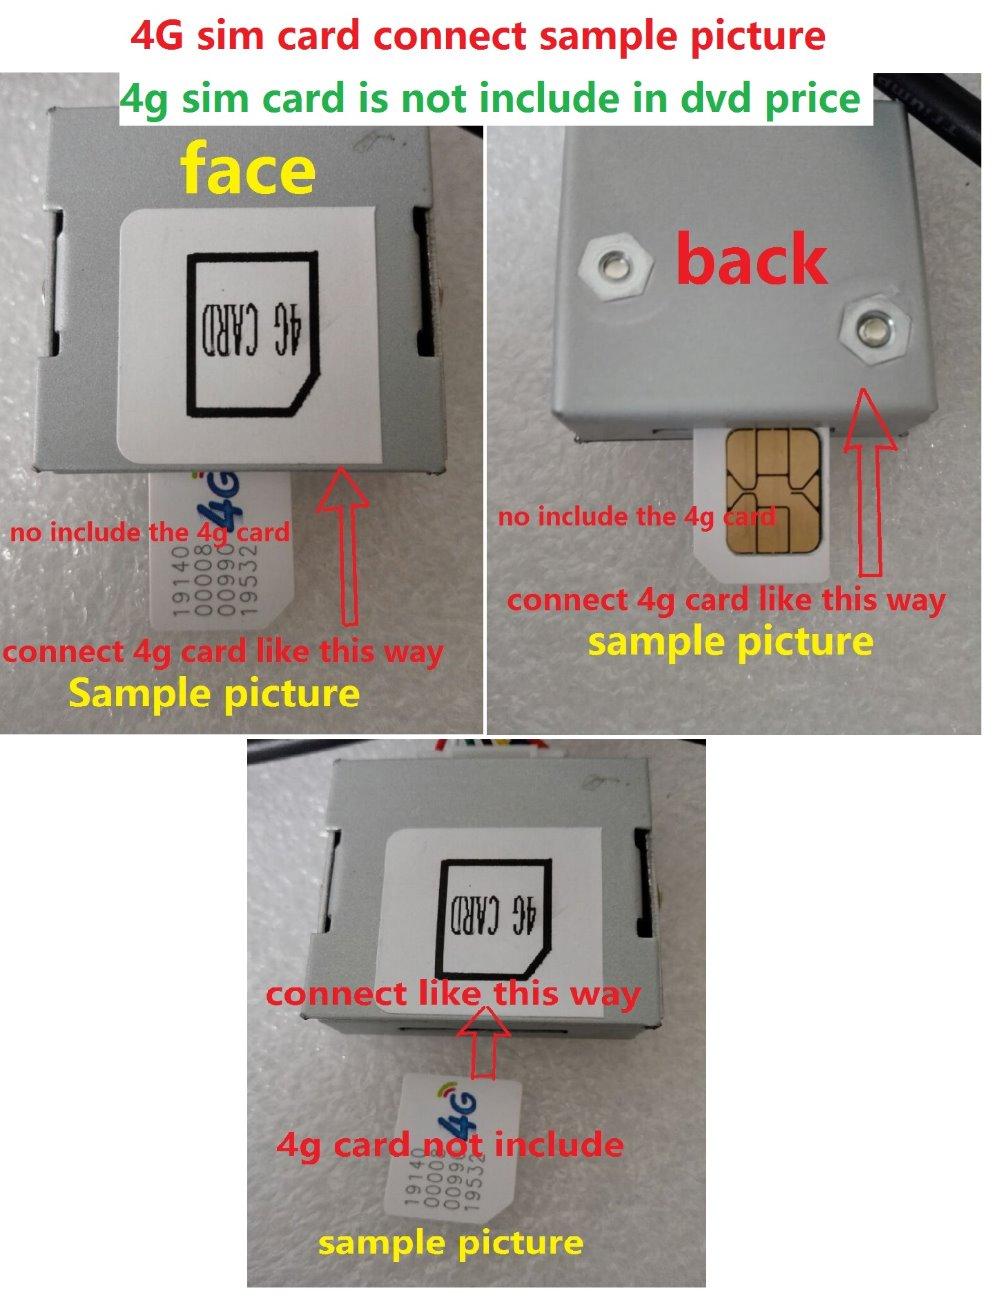 4g sim card connect way